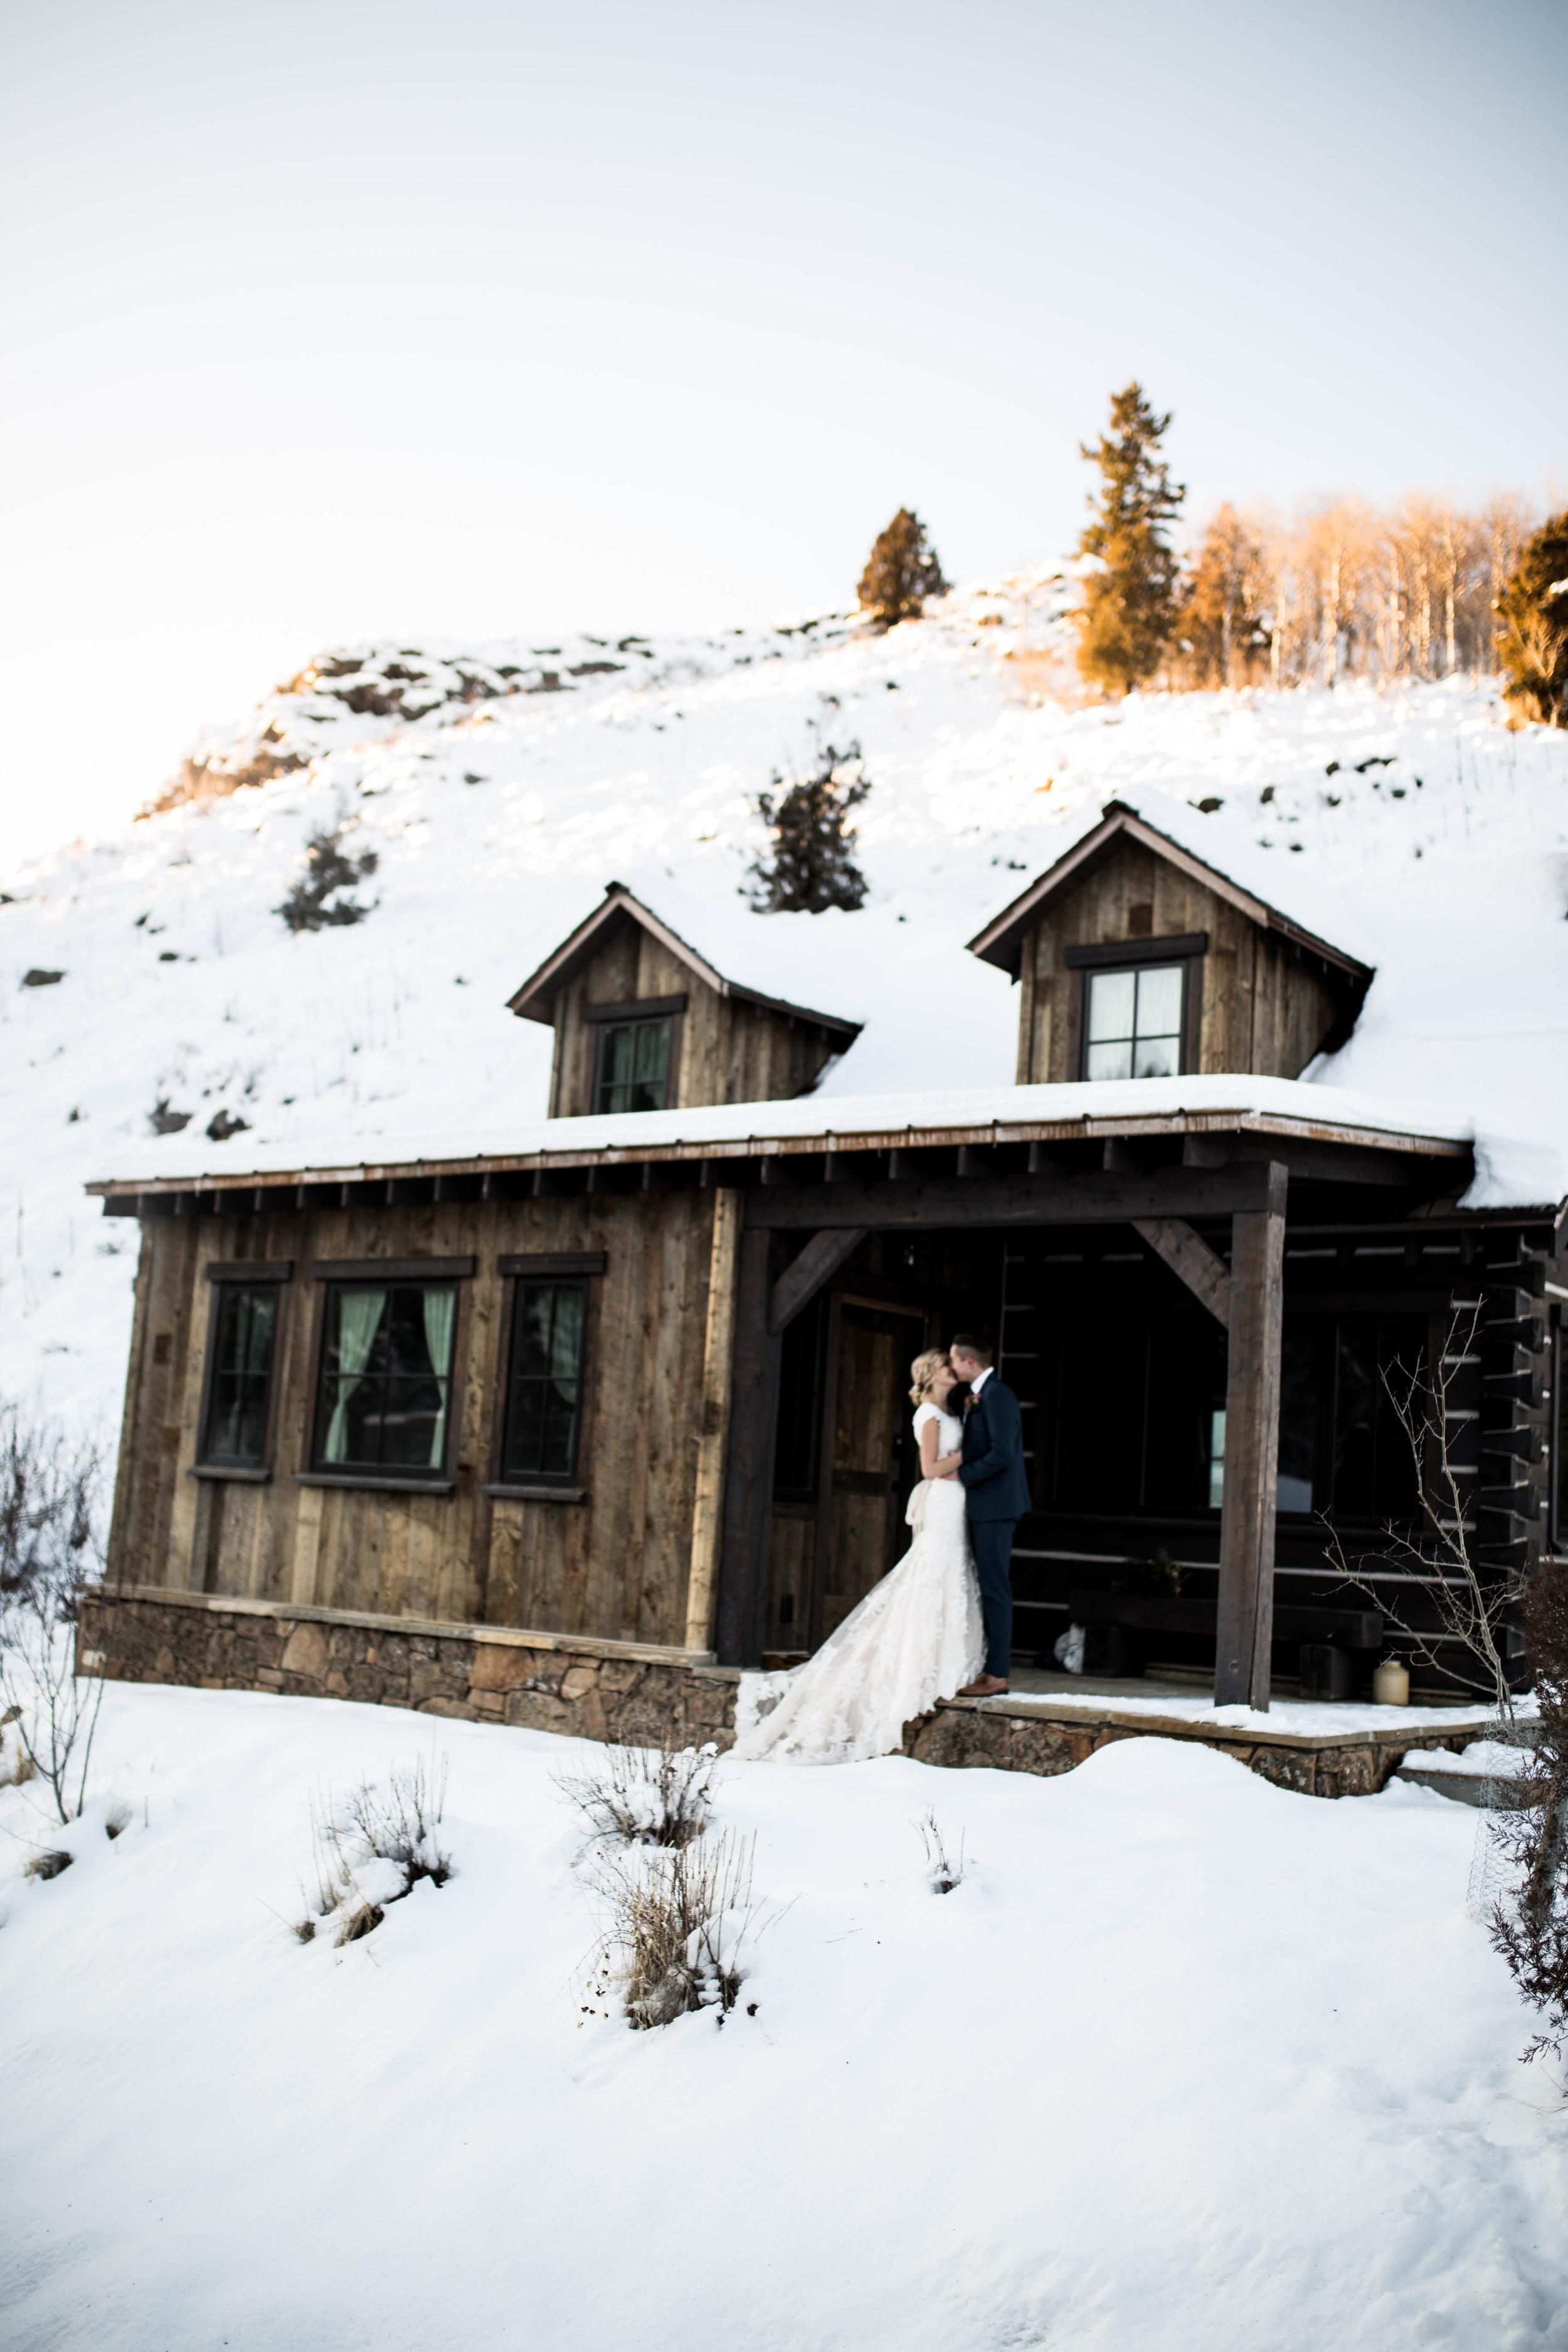 WinterWeddingBridalsTarghee (65 of 121).jpg